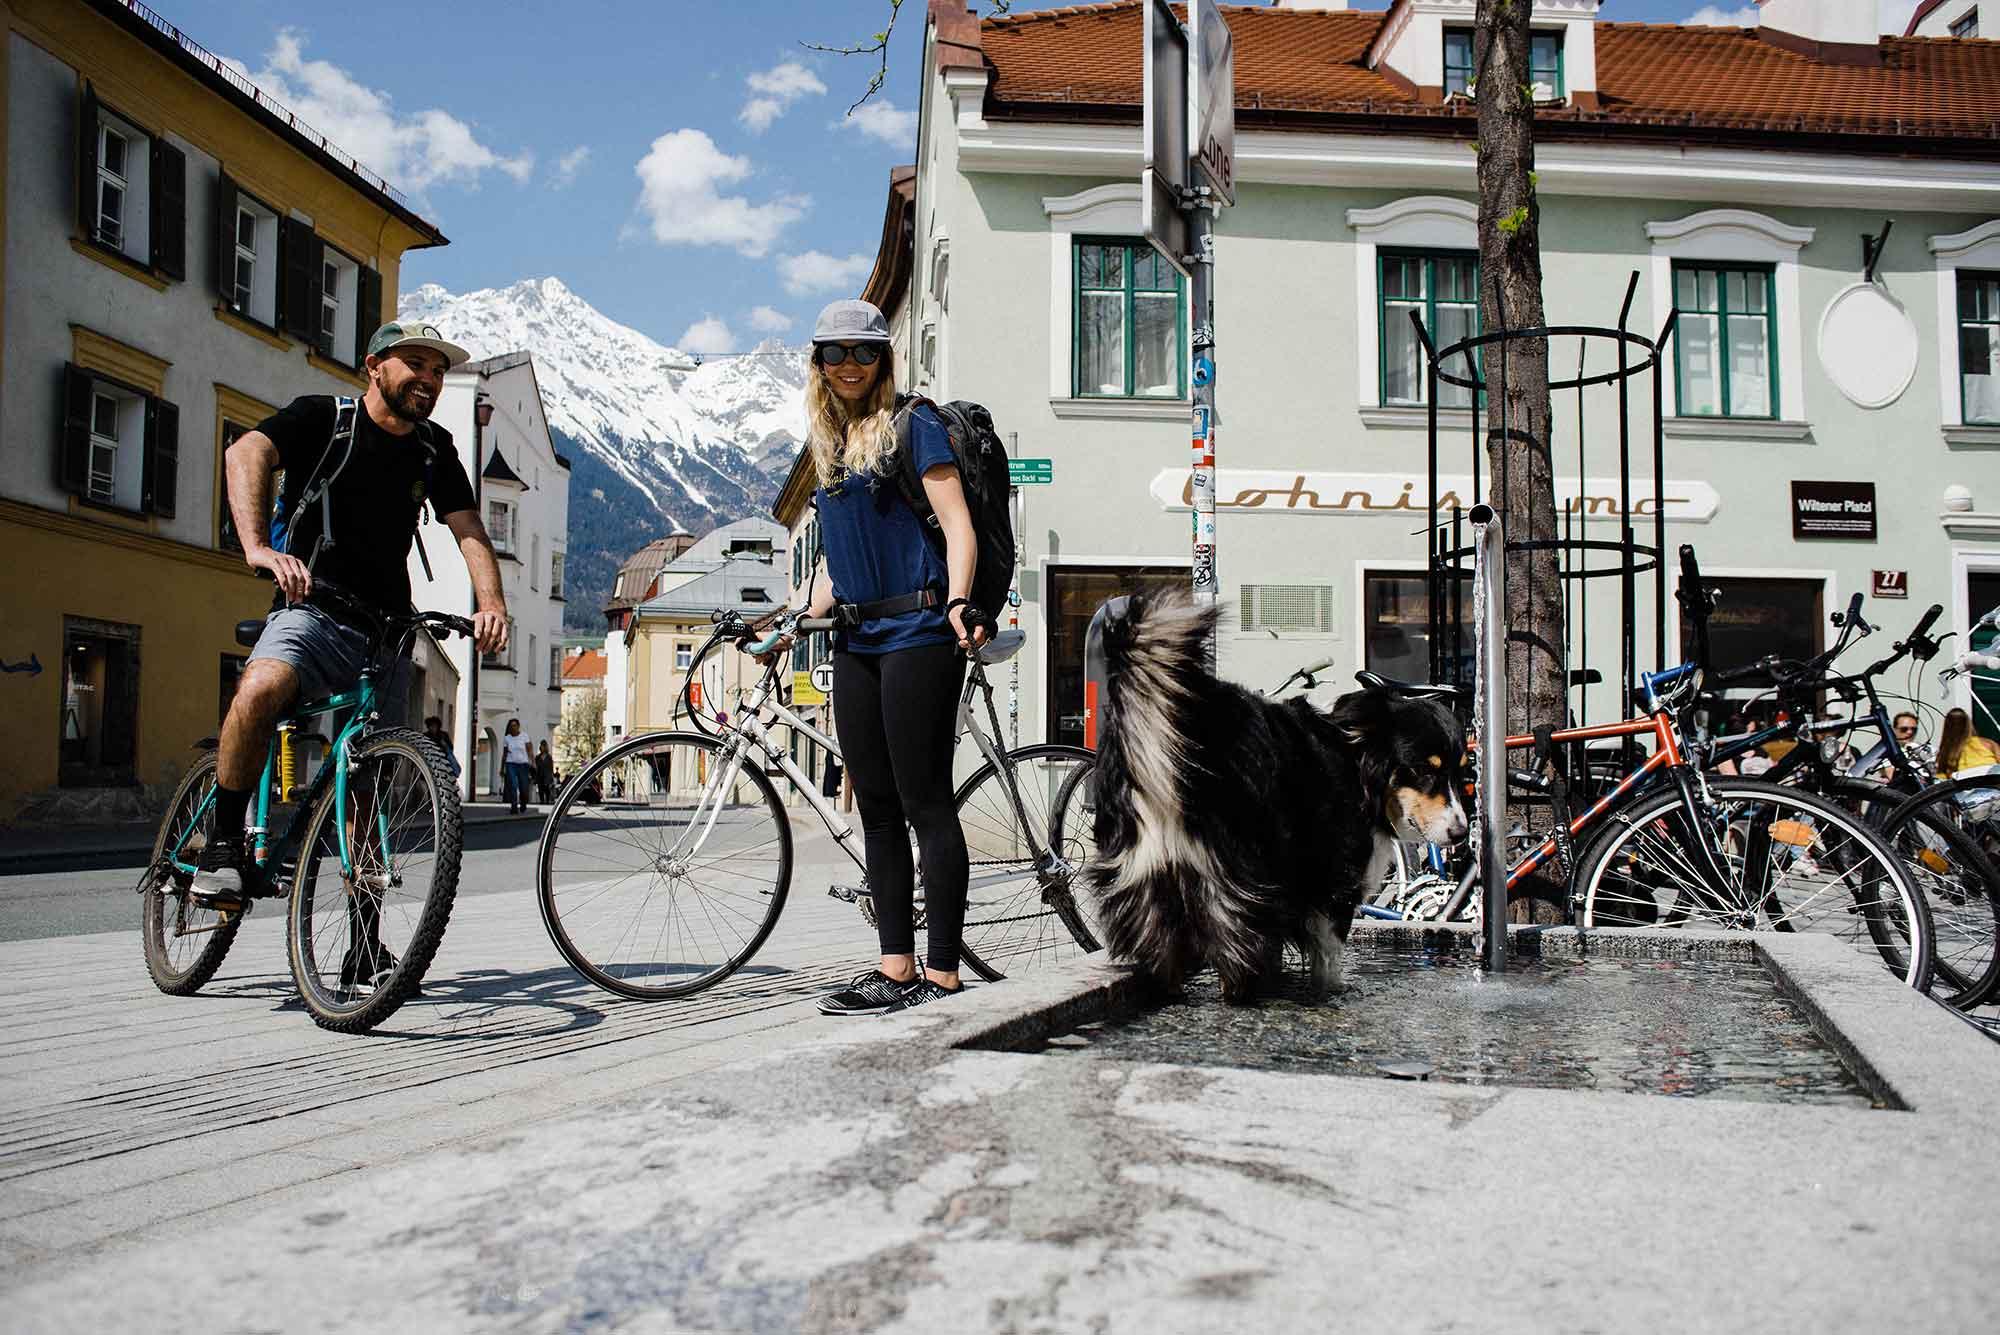 A man and woman walk a dog in Innsbruck, Austria